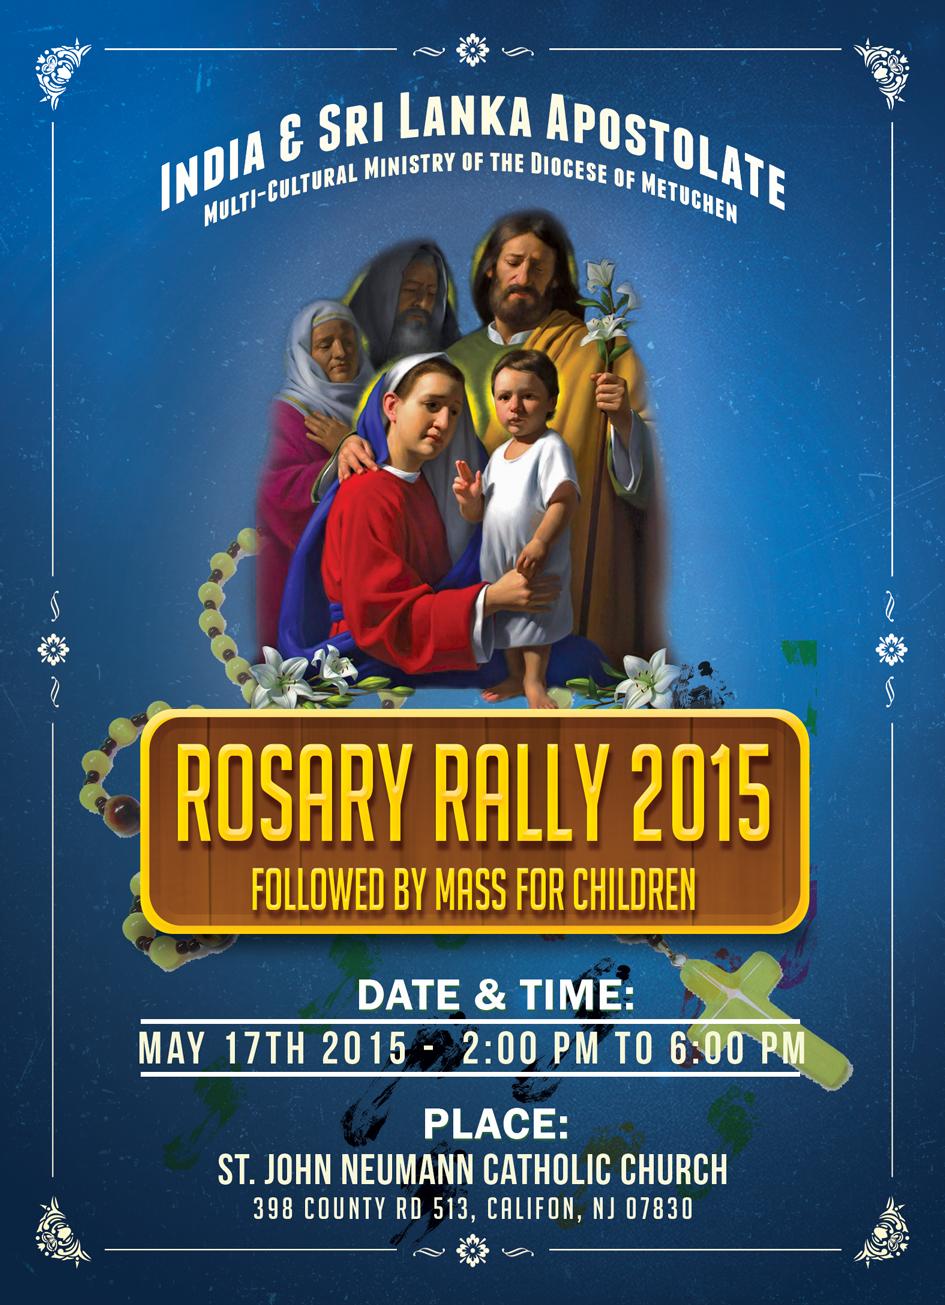 RosaryRally2015